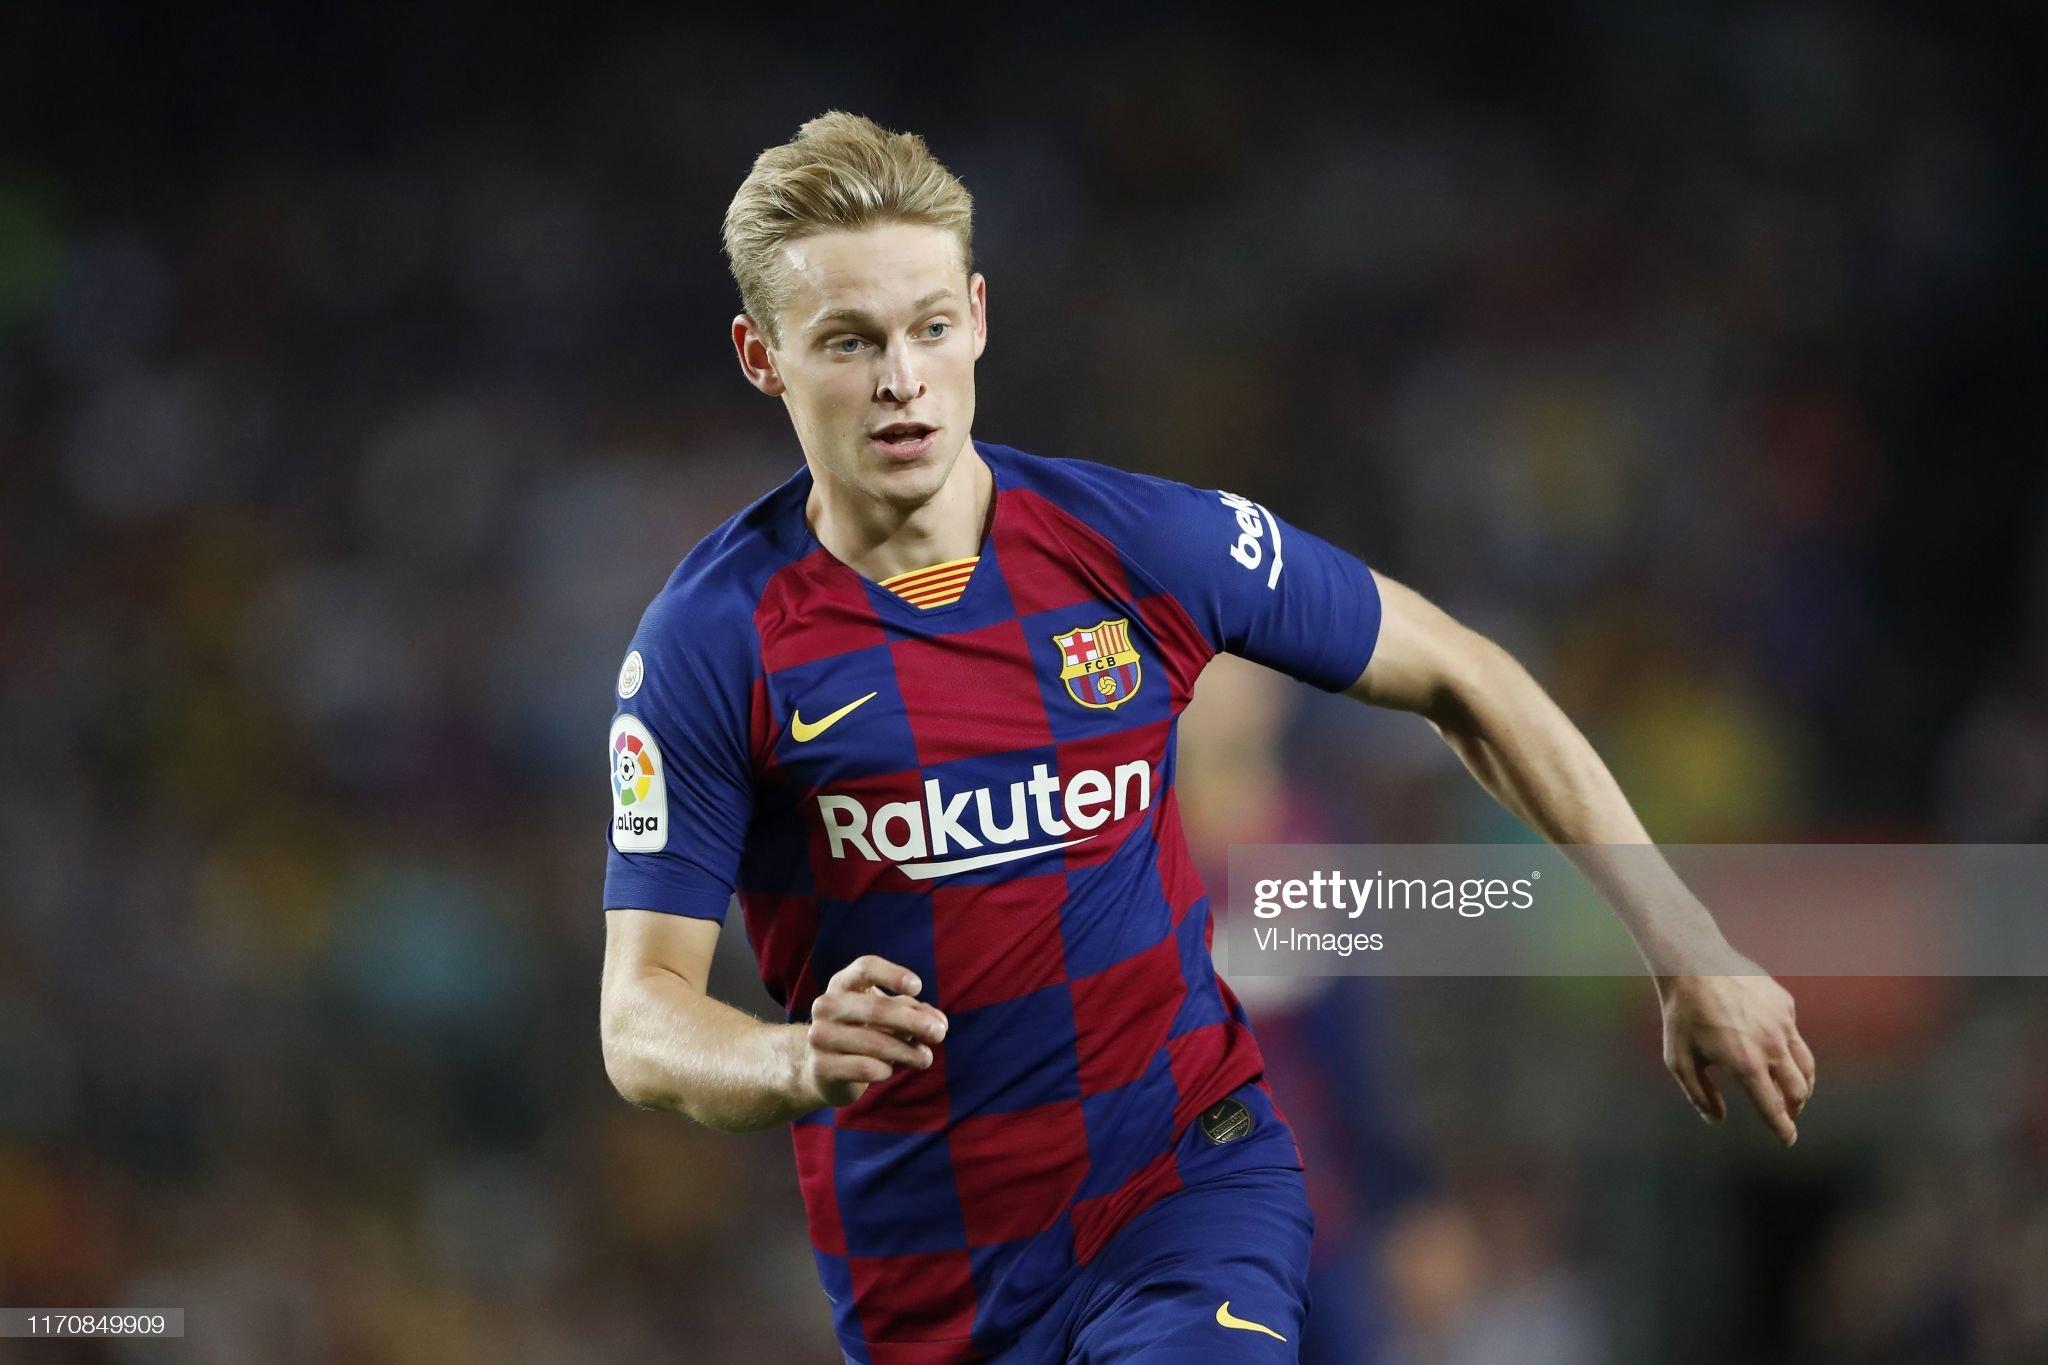 صور مباراة : برشلونة - فياريال 2-1 ( 24-09-2019 )  Frenkie-de-jong-of-fc-barcelona-during-the-laliga-santander-match-fc-picture-id1170849909?s=2048x2048